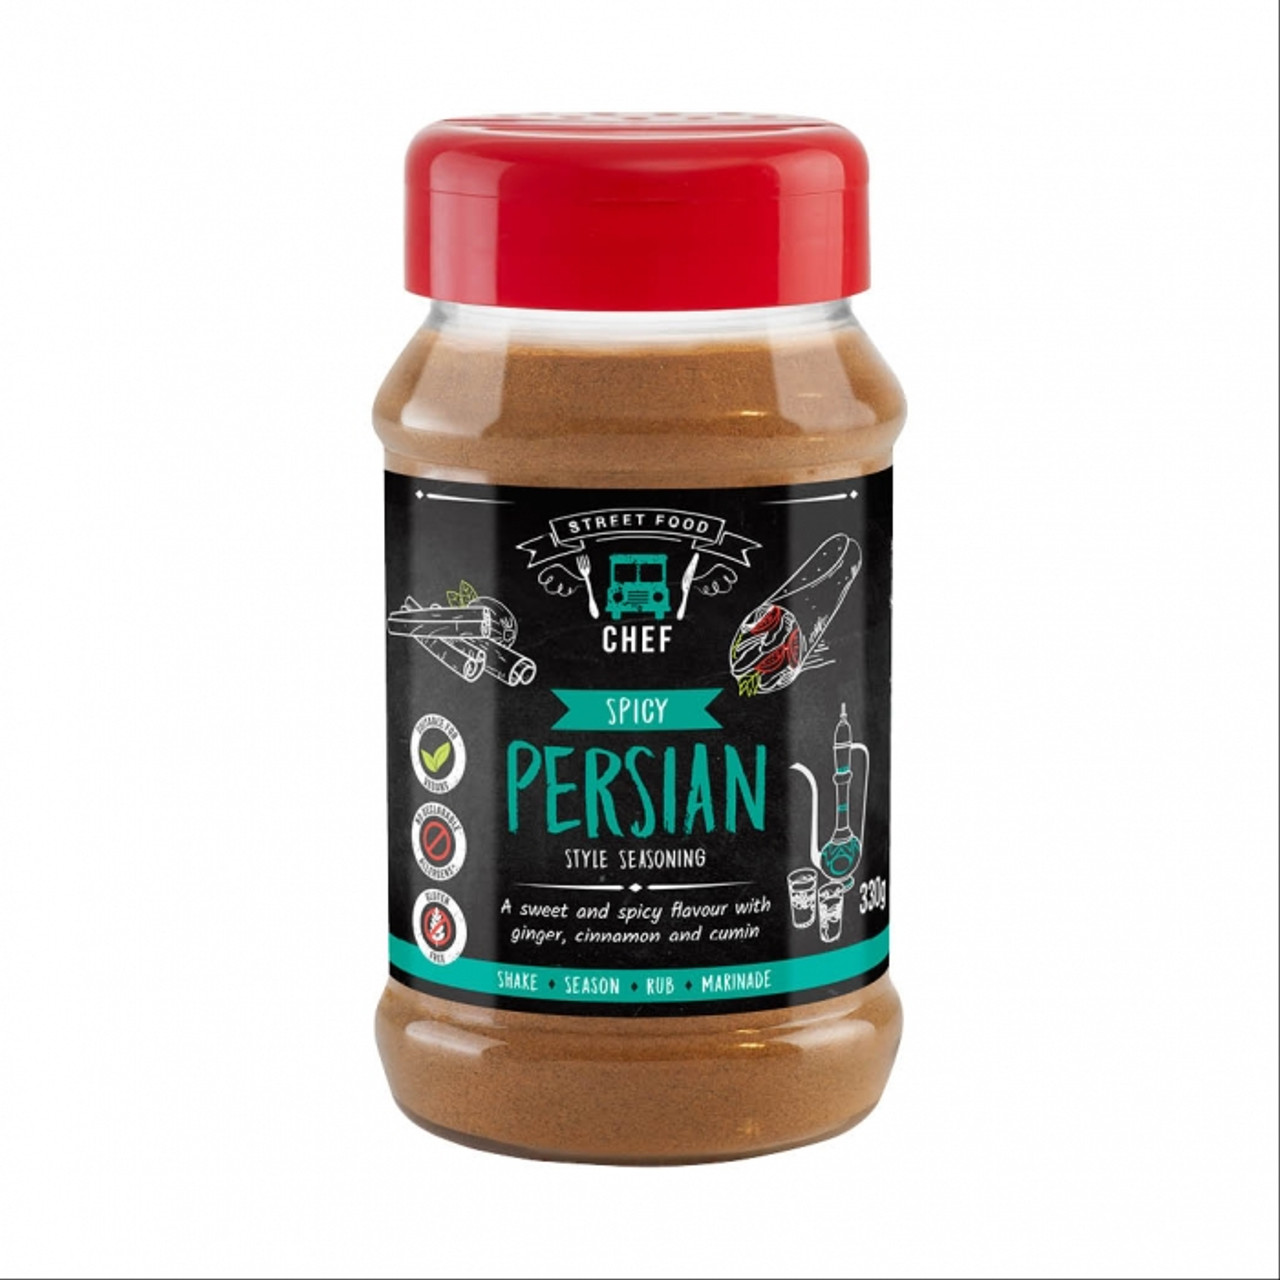 ESSENTIAL CUISINE PERSIAN SEASONING 330g